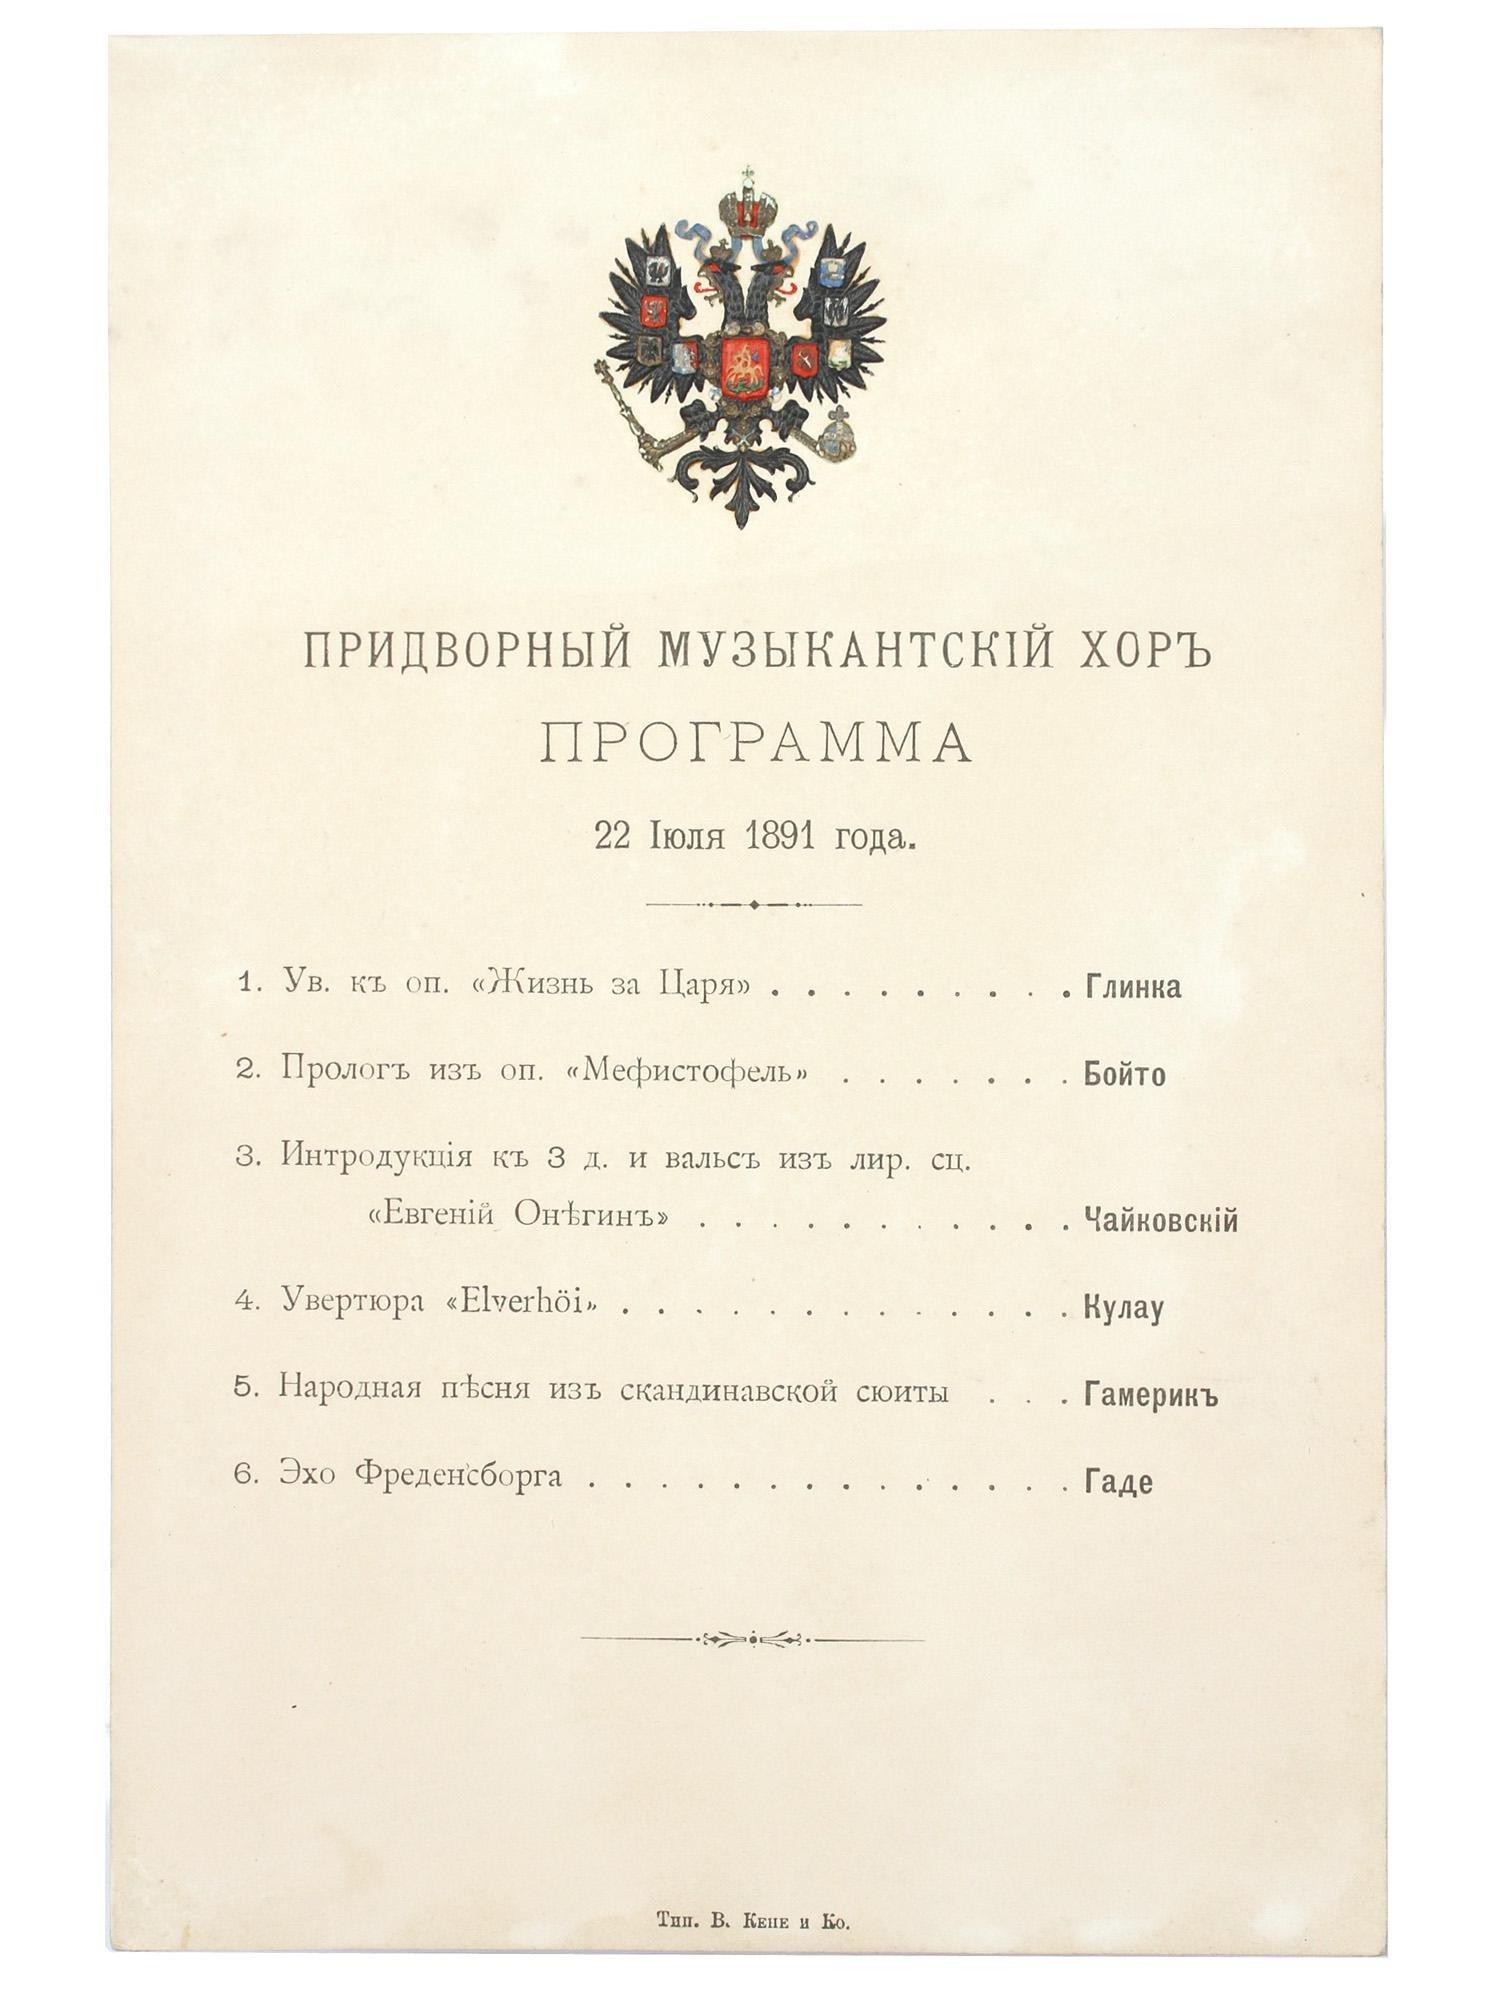 A RUSSIAN IMPERIAL COURT MUSICAL CHORUS  PLAYBILL